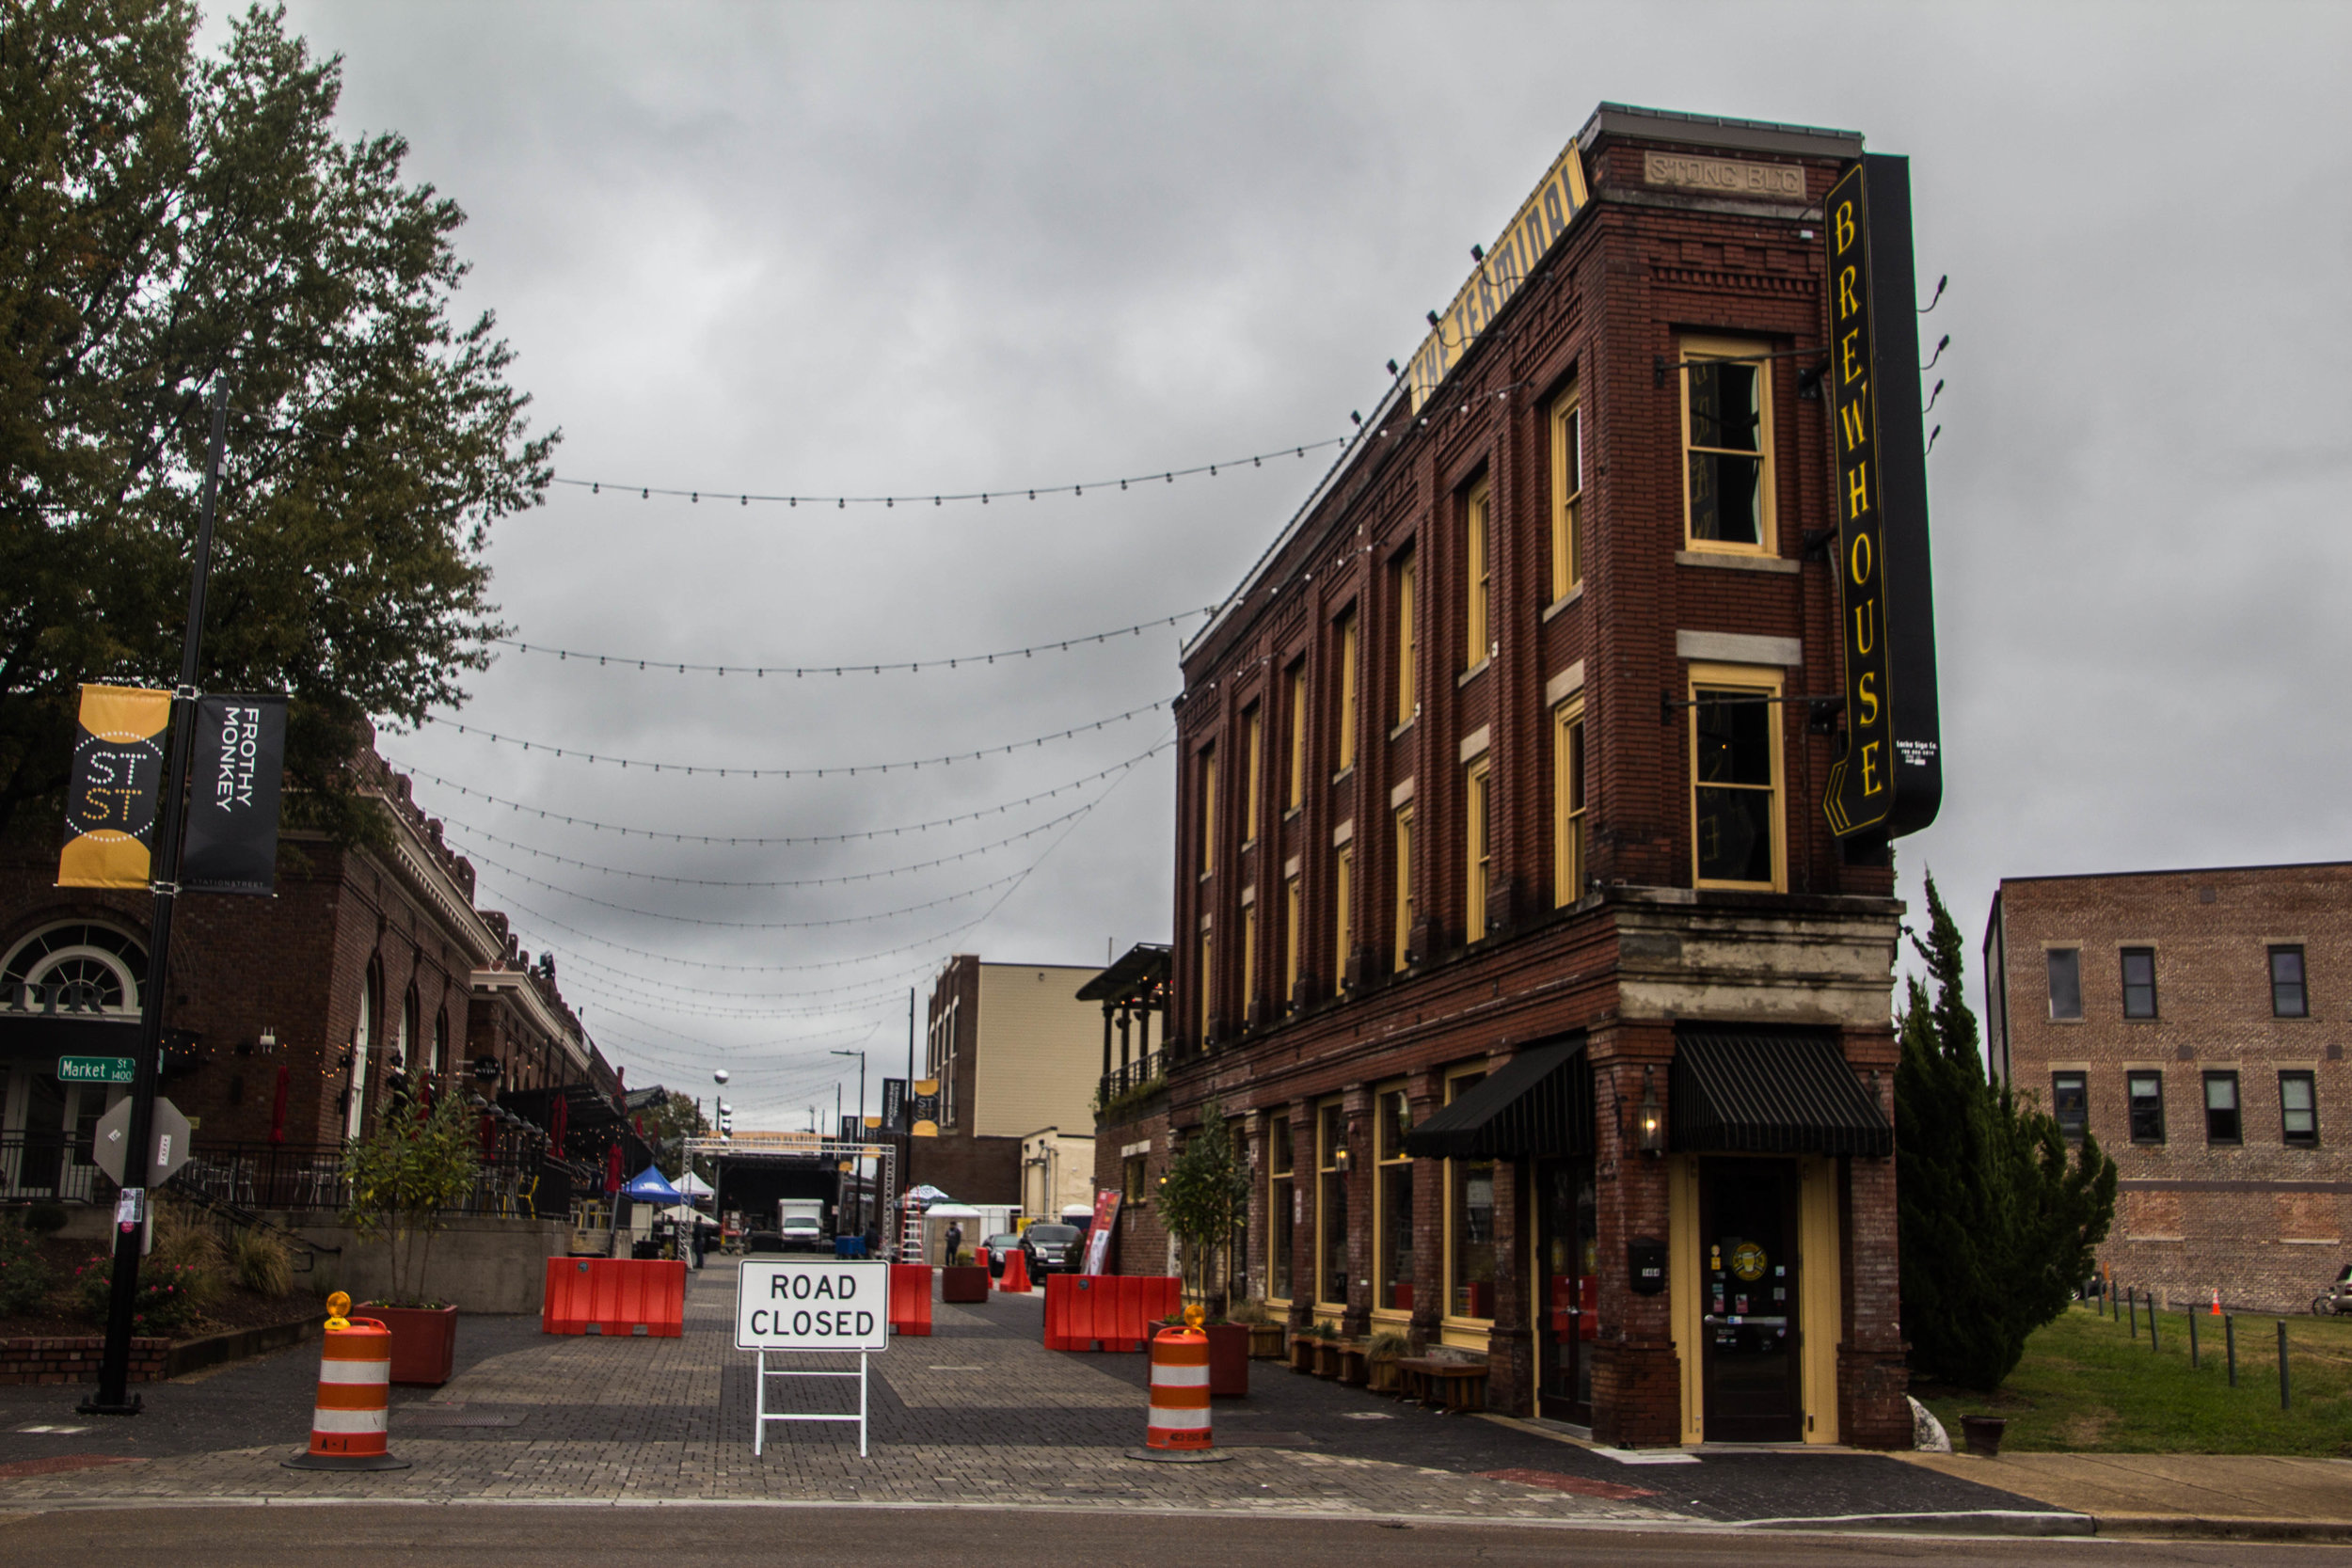 terminal-chattanooga-bars-restaurants-4.jpg